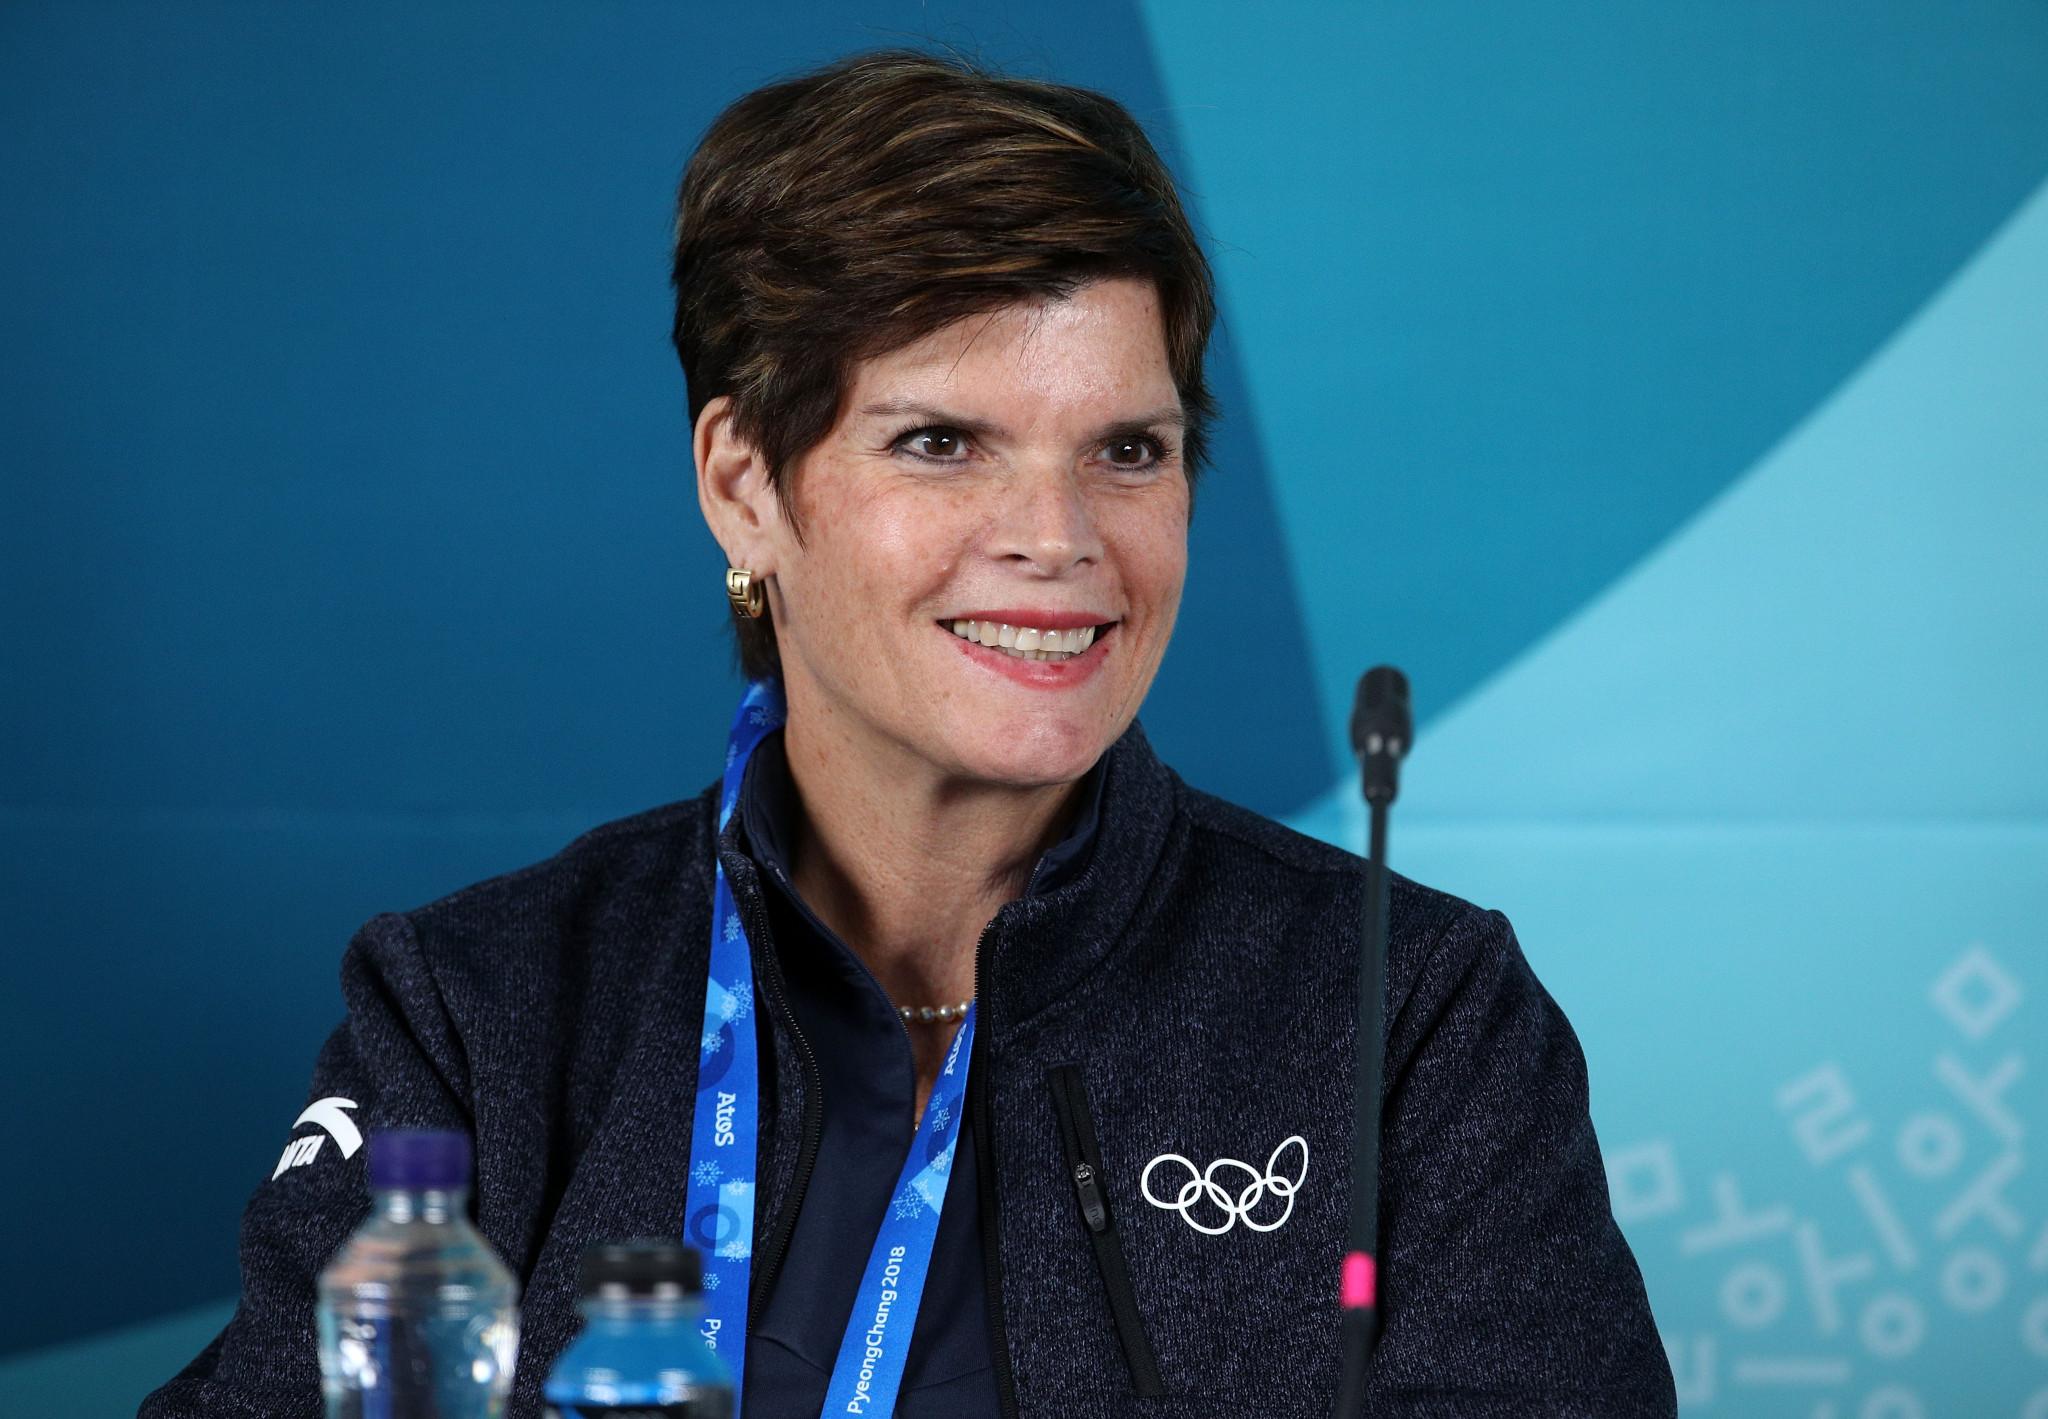 CANOC's Nicole Hoevertsz is new IOC Vice President